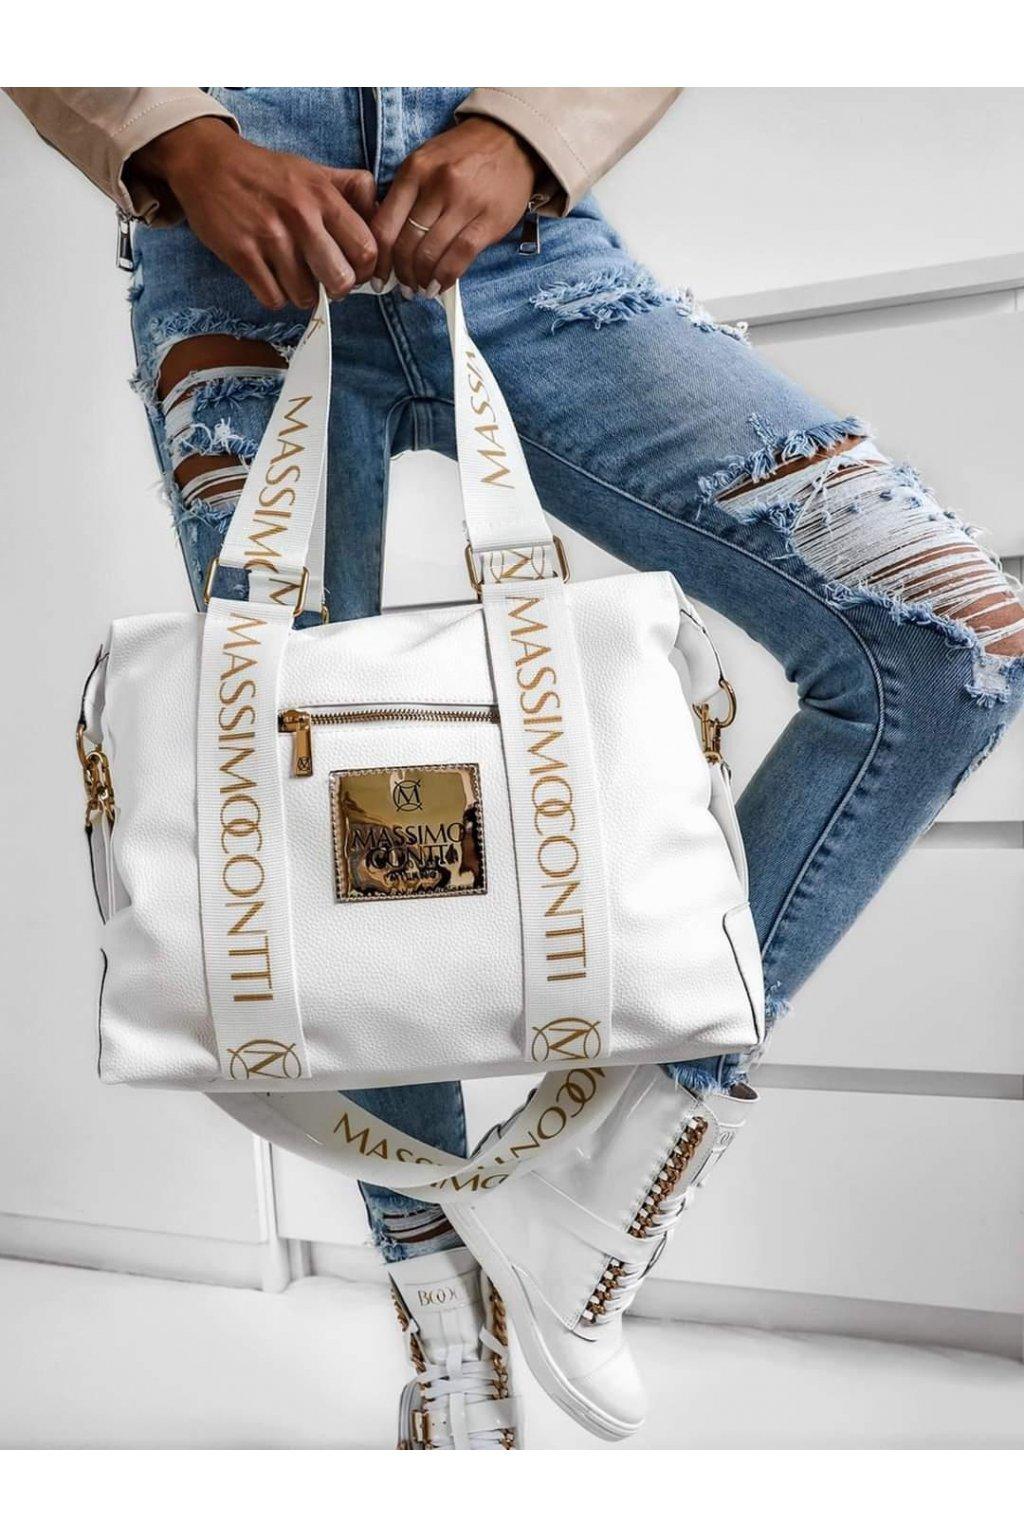 Massimo contii italy fashion kabelka trendy bílá white